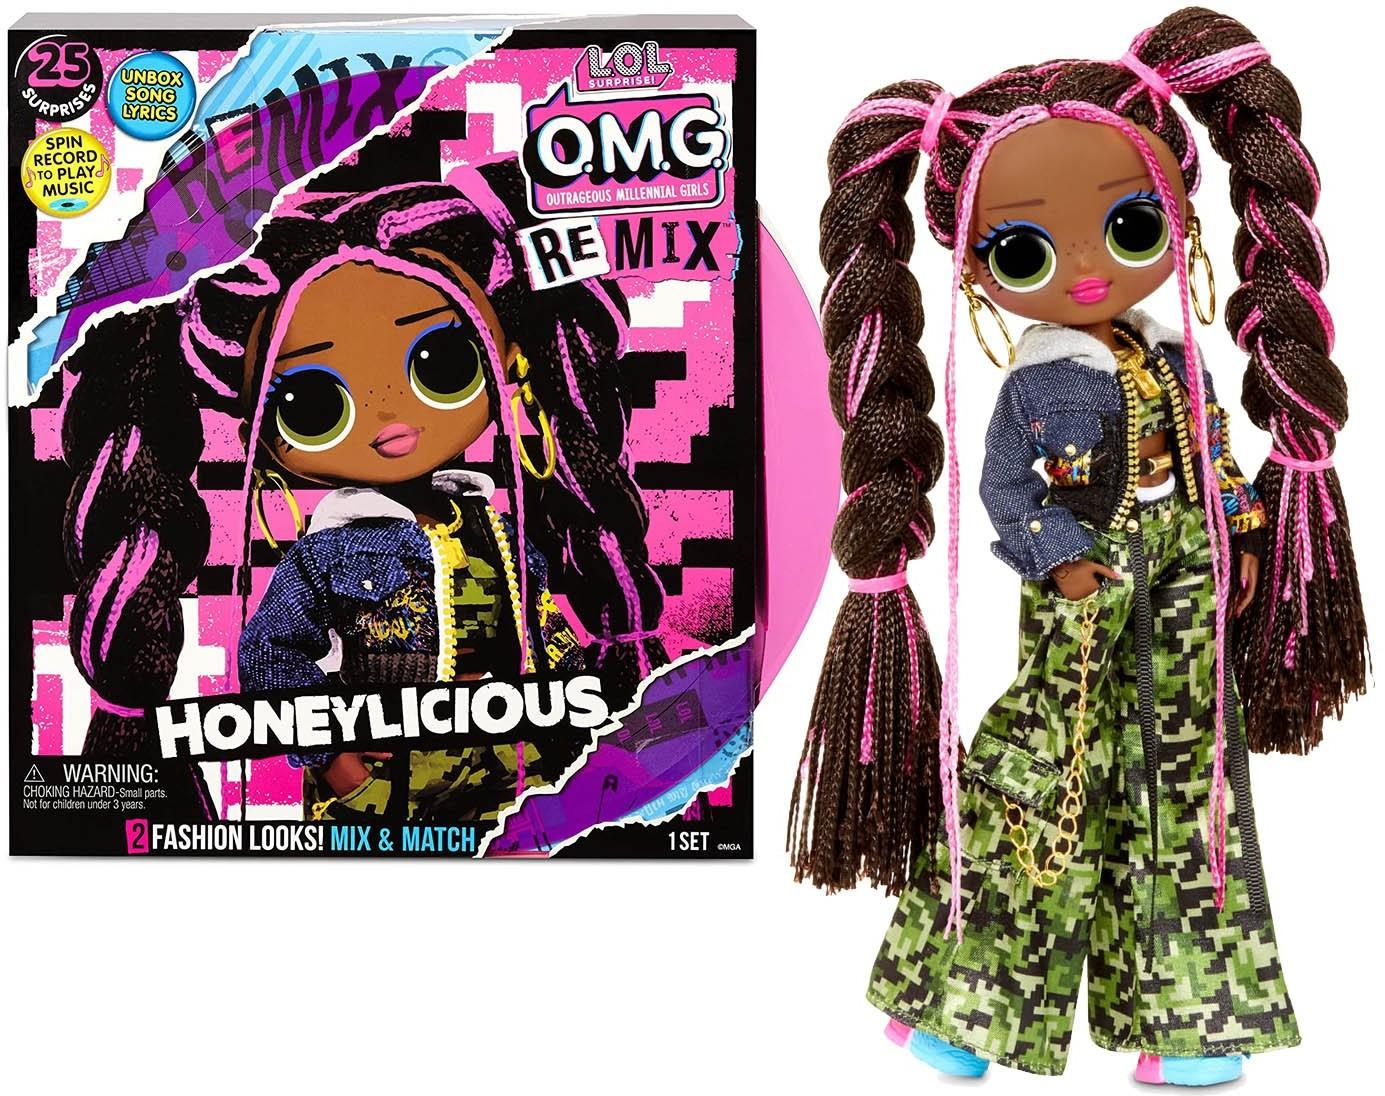 LOL Surprise LOL Surprise OMG Remix Honeylicious Hip Hop lalka modowa 567264 0000042883